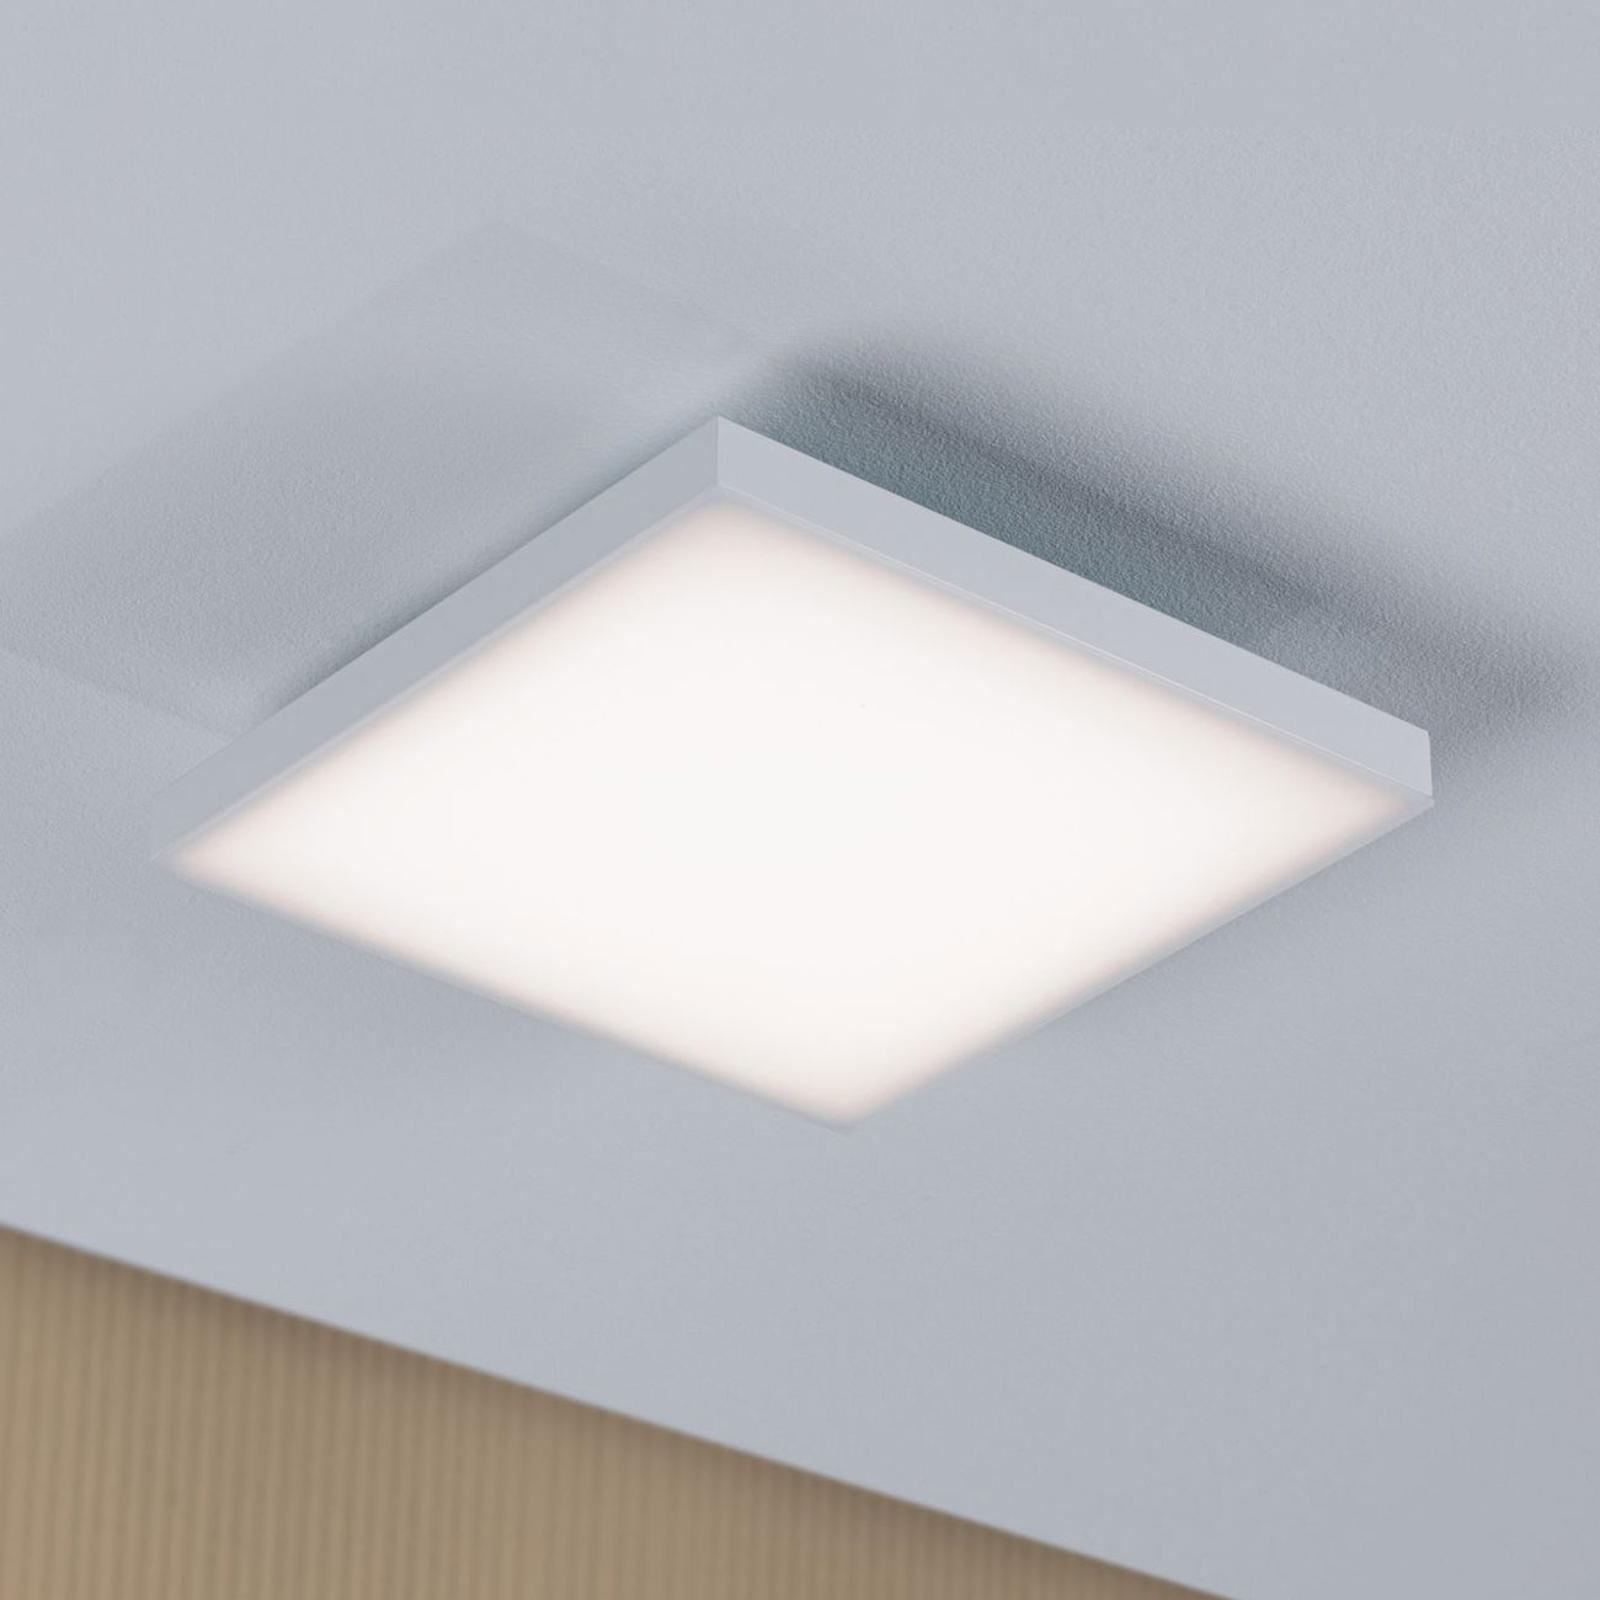 Paulmann Velora LED wandlamp 22,5 x 22,5cm